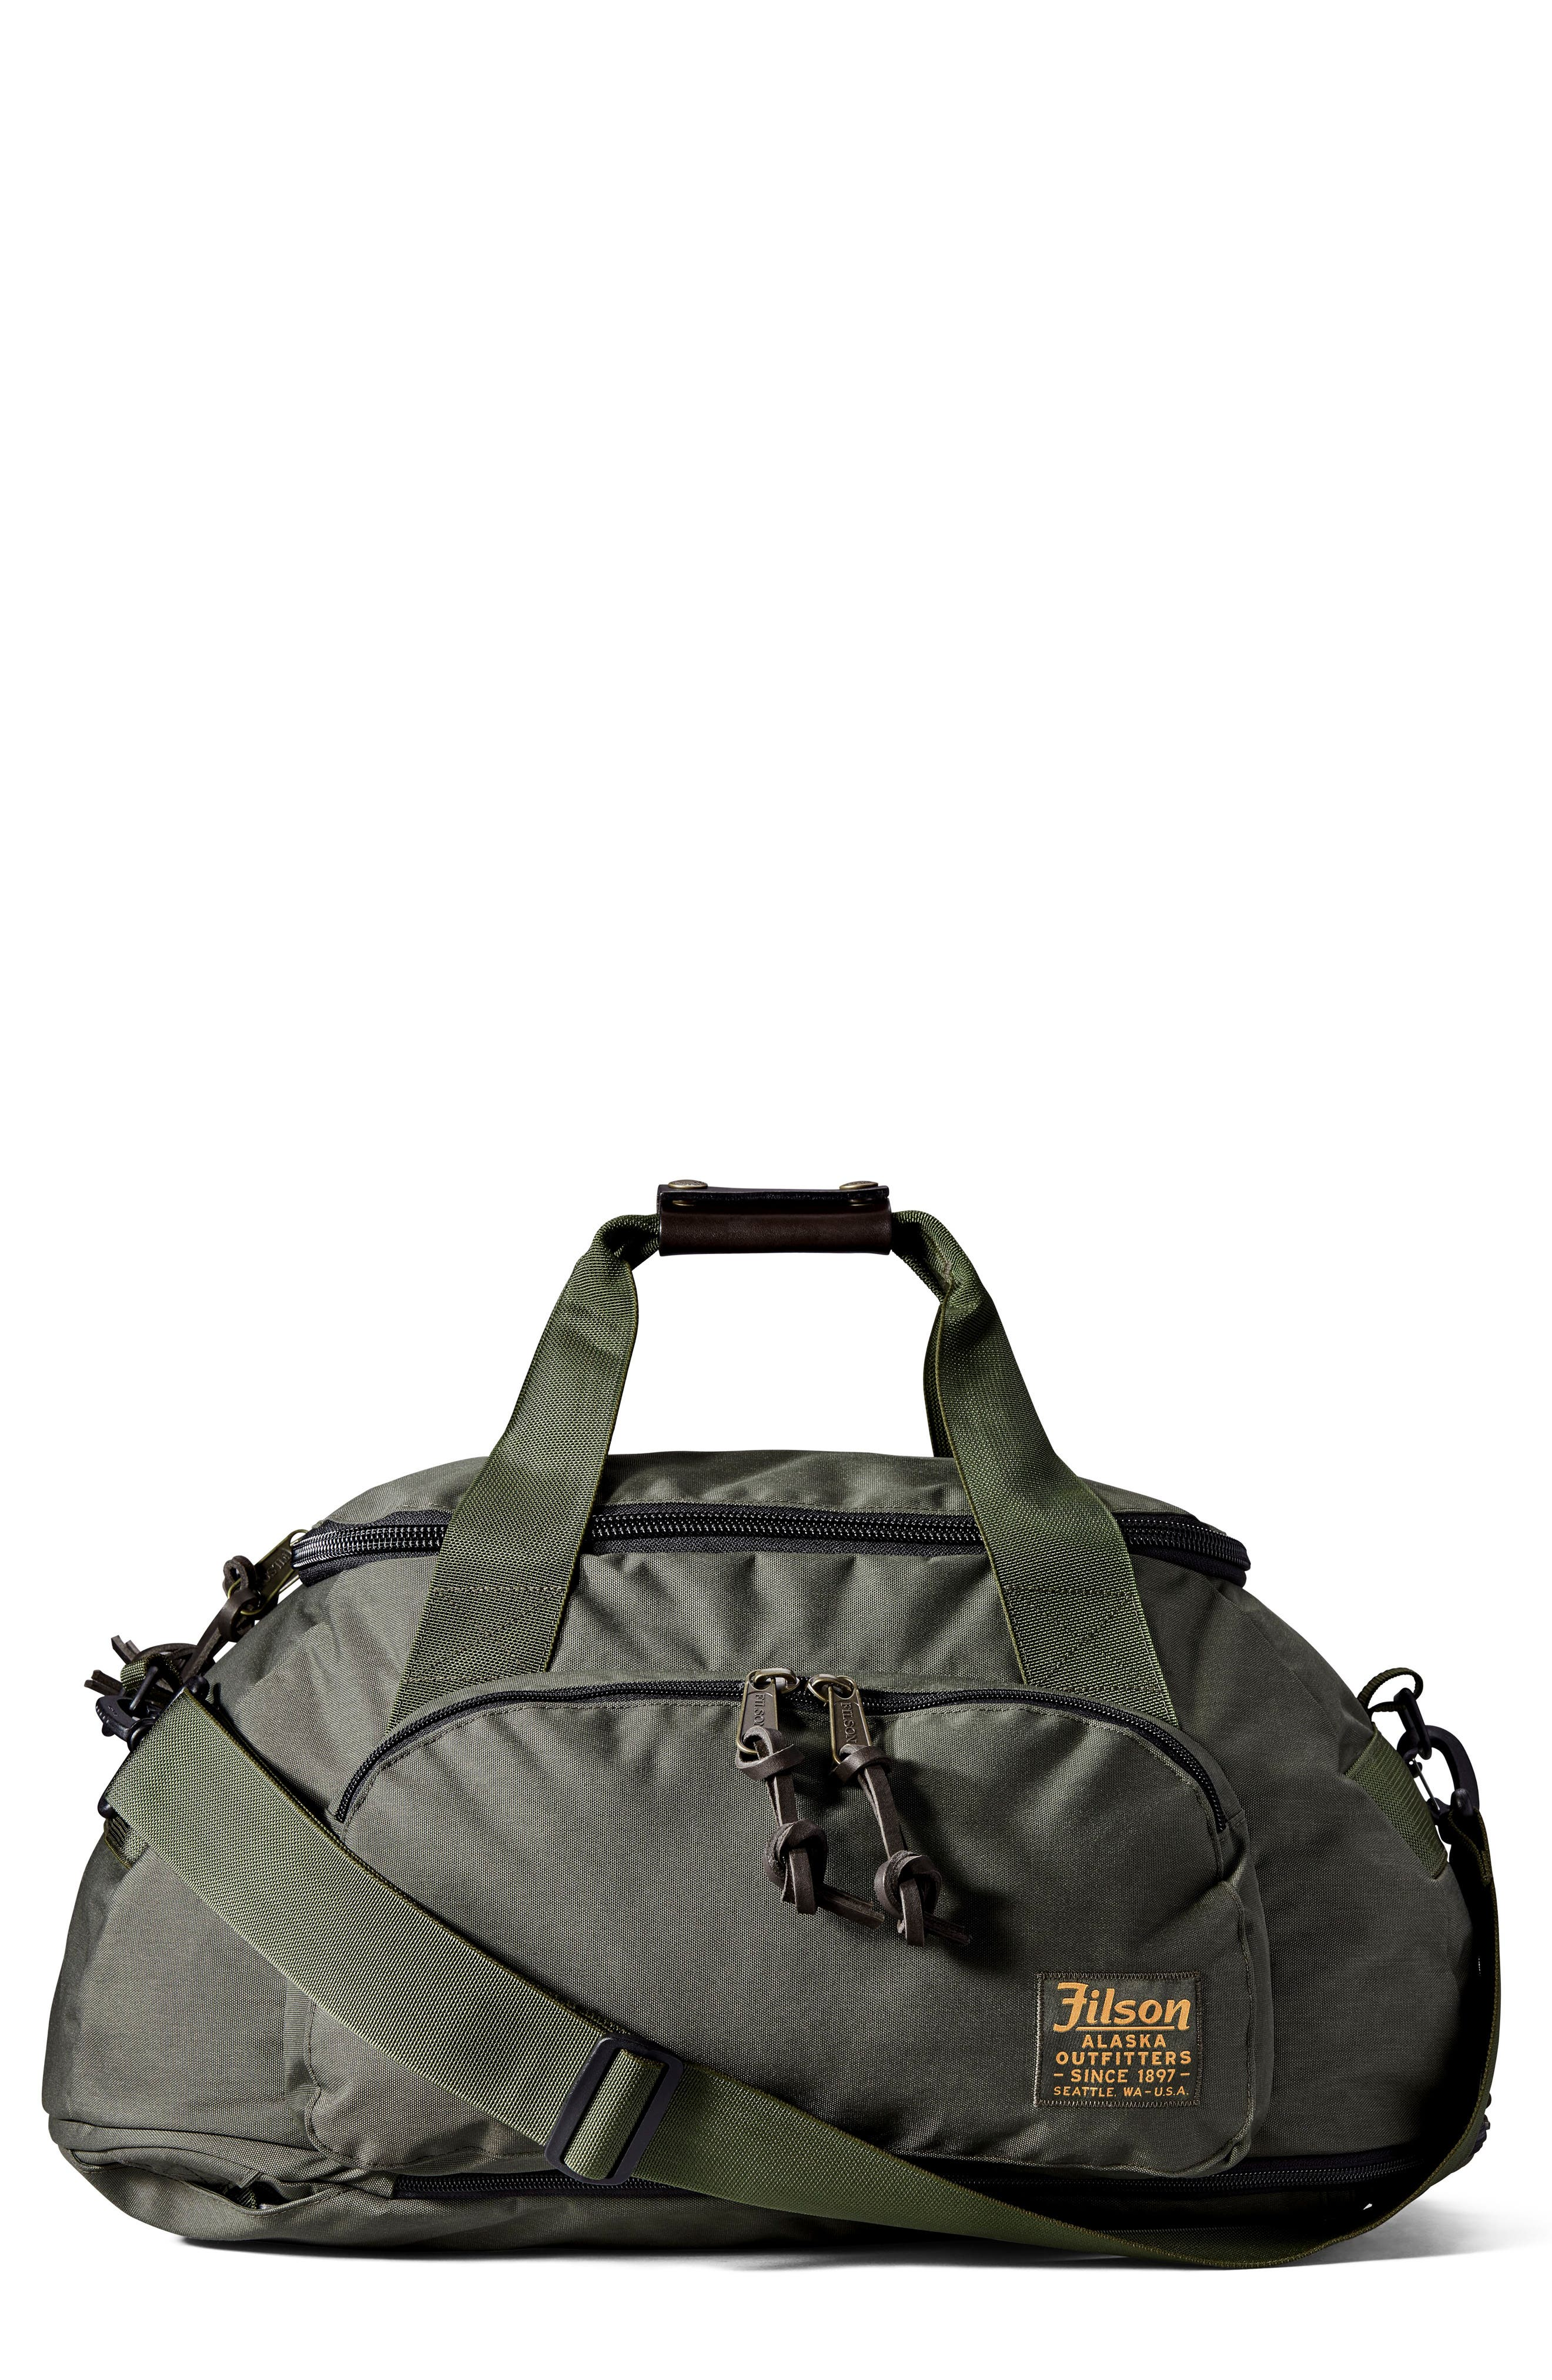 Convertible Duffel Bag,                             Main thumbnail 1, color,                             Otter Green